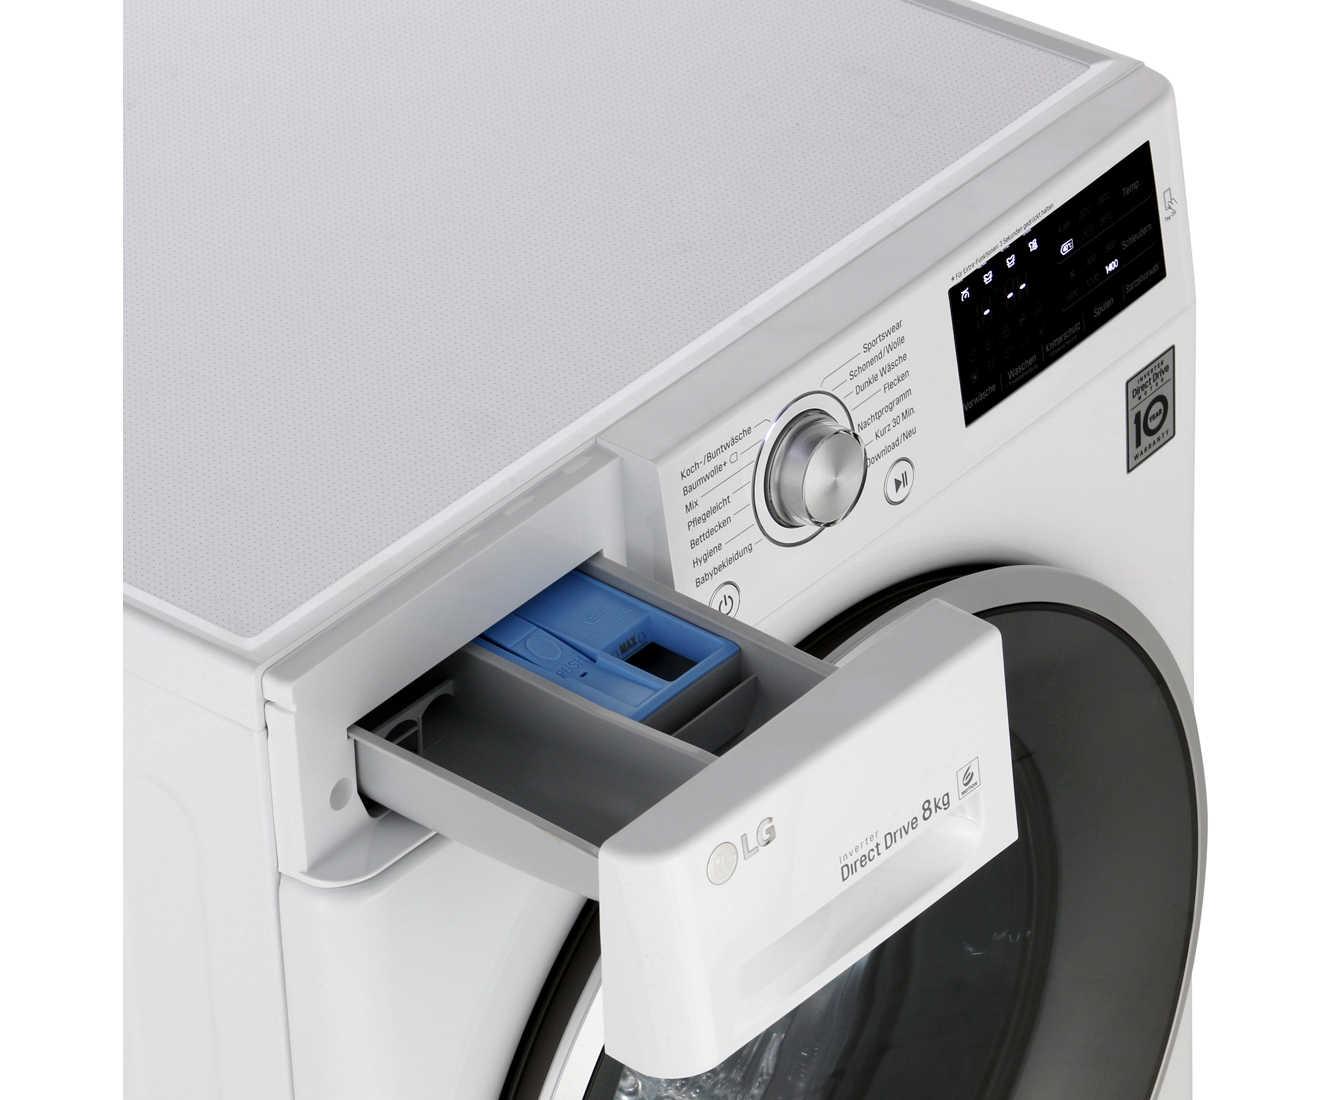 f14wm8cn1 wh lg waschmaschine 05 ux l